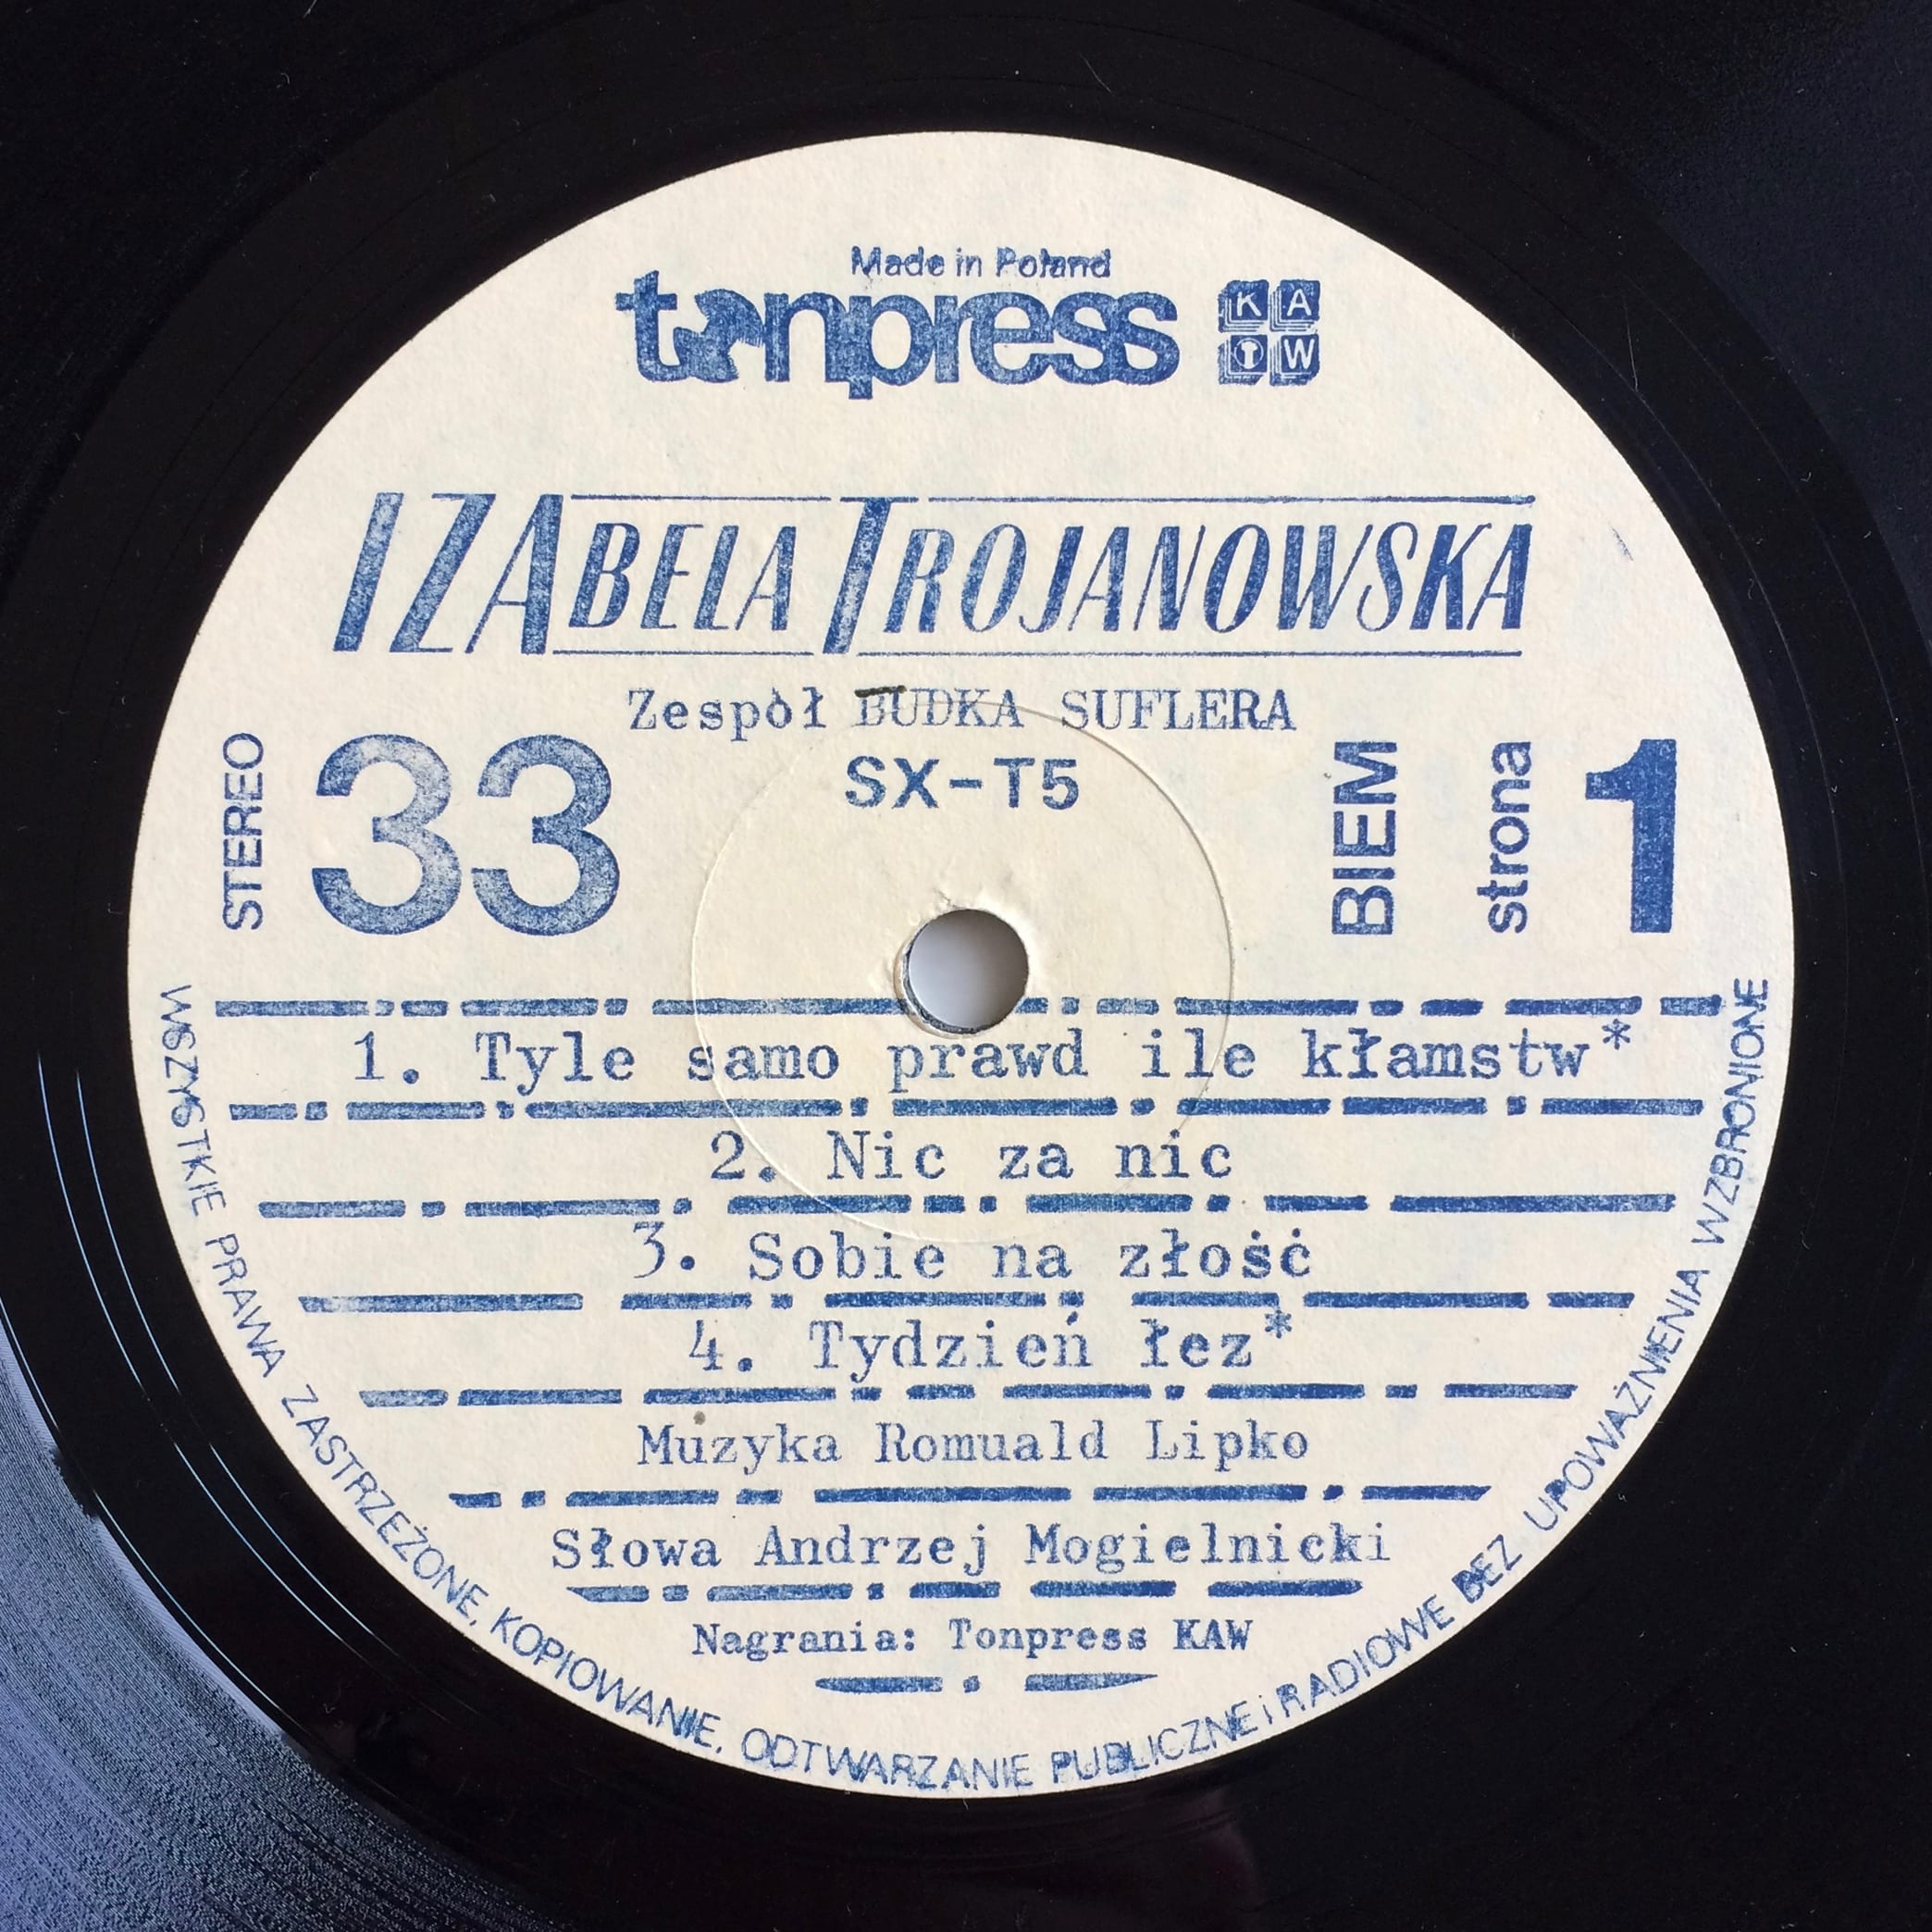 Izabela Trojanowska - Iza - Tonpress – SX-T5 -Poland - 1981